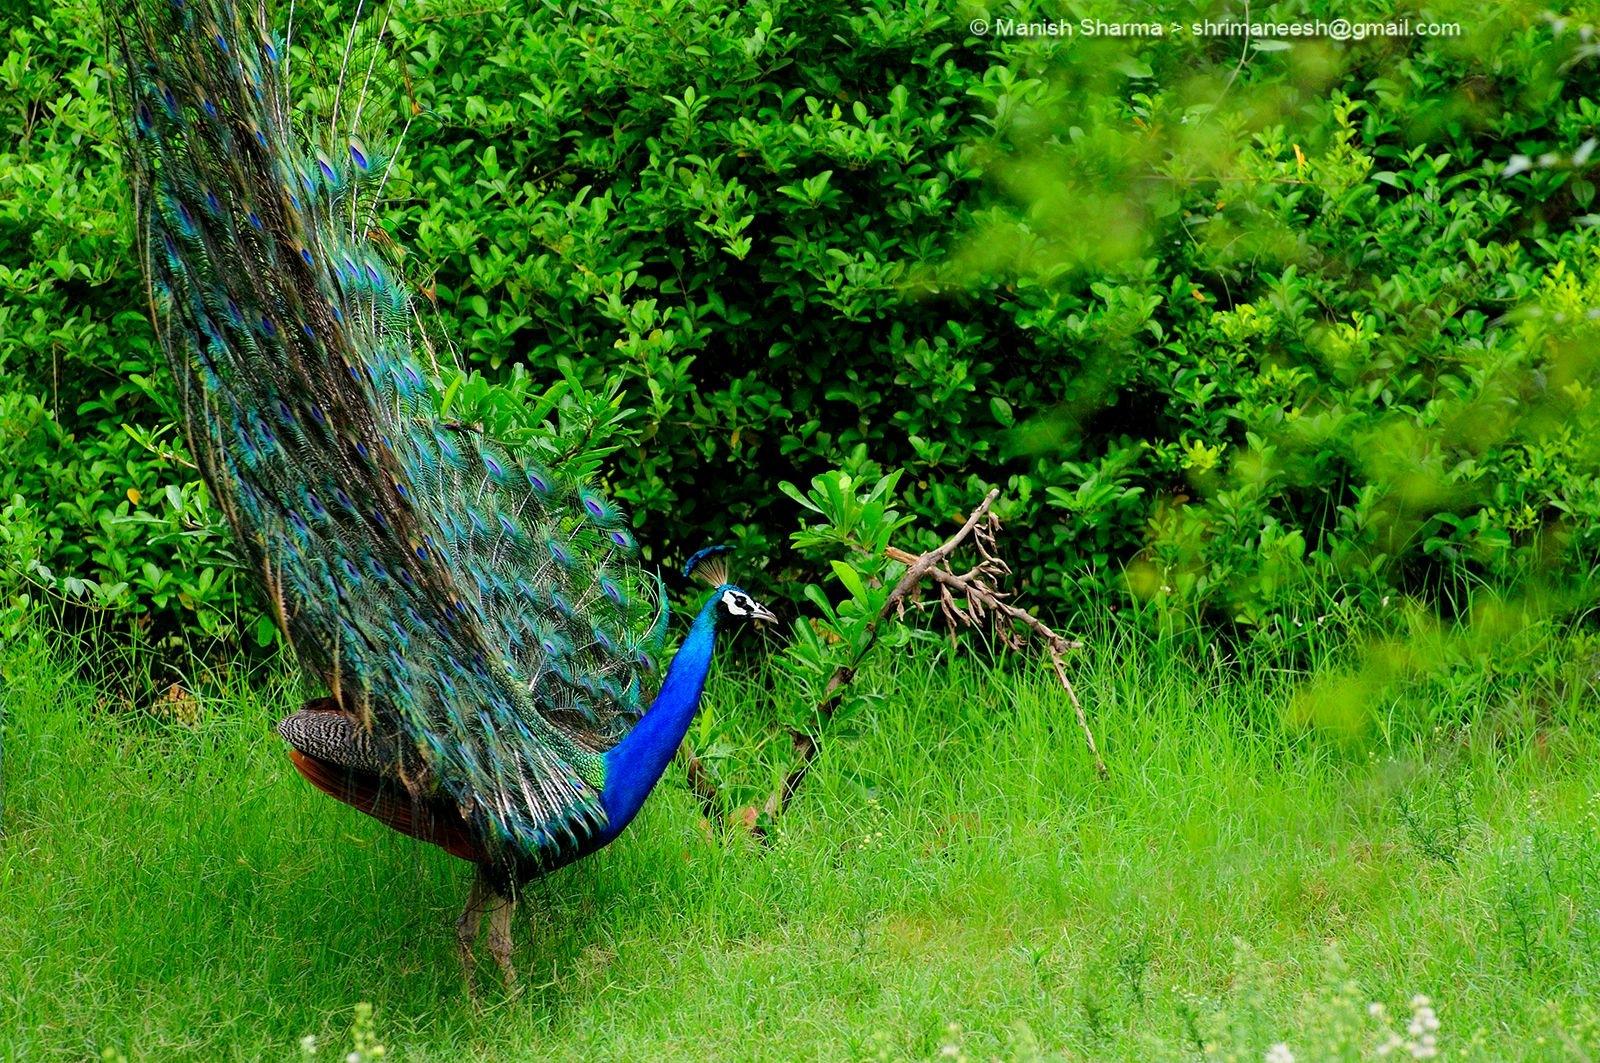 Peacock ...Scientific name: Pavo cristatus by Maneesh Sharma